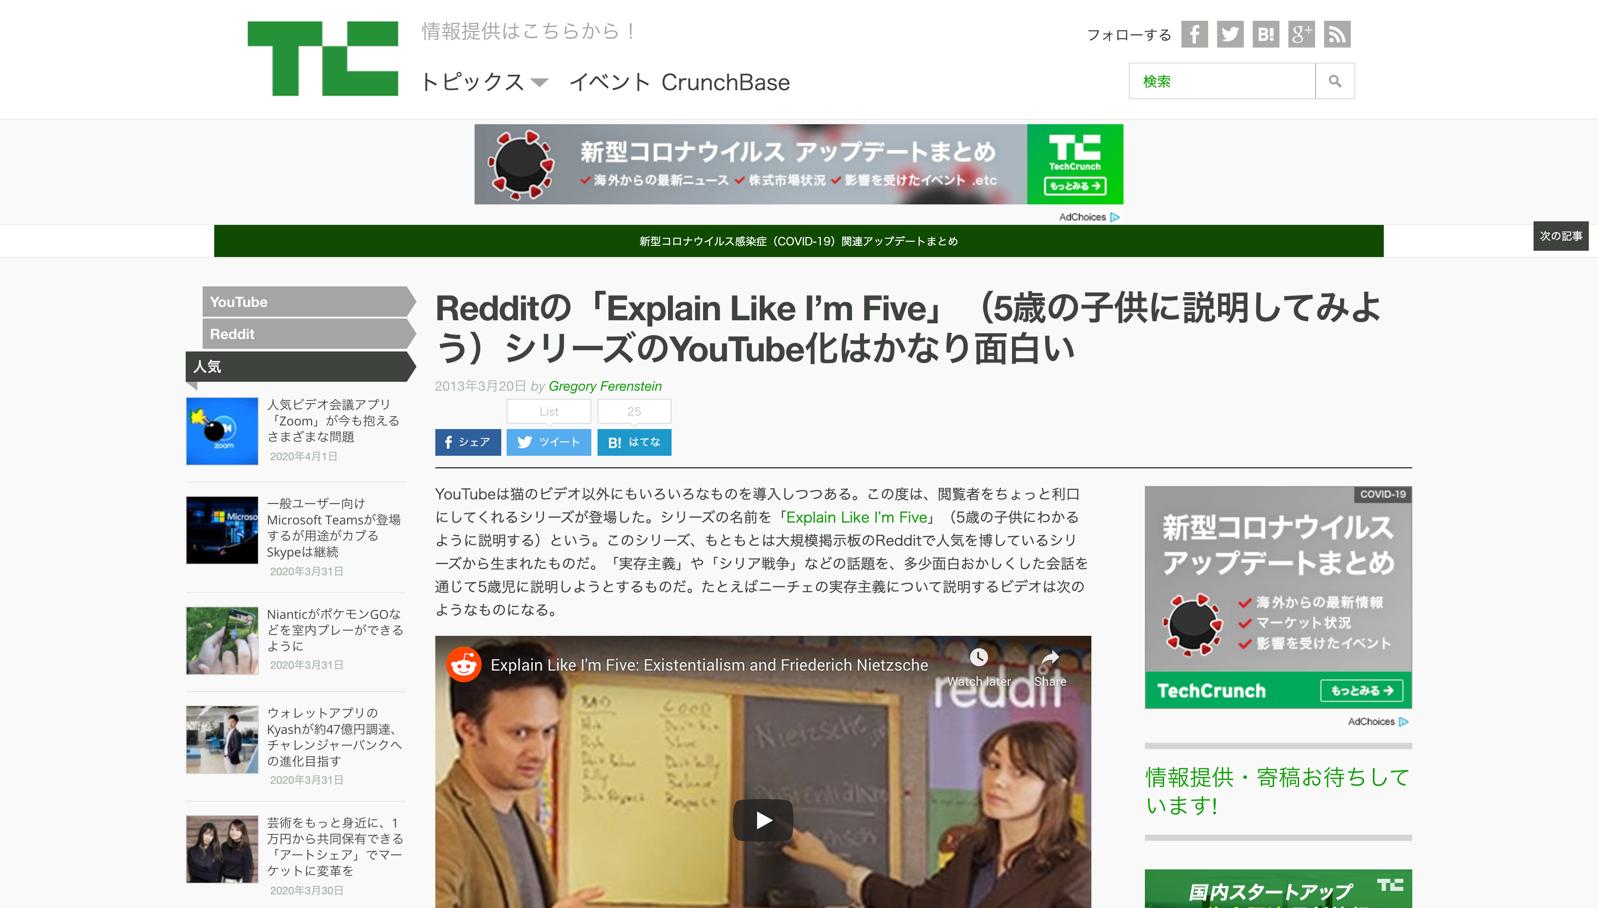 Redditの Explain Like I m Five 5歳の子供に説明してみよう シリーズのYouTube化はかなり面白い | TechCrunch Japan